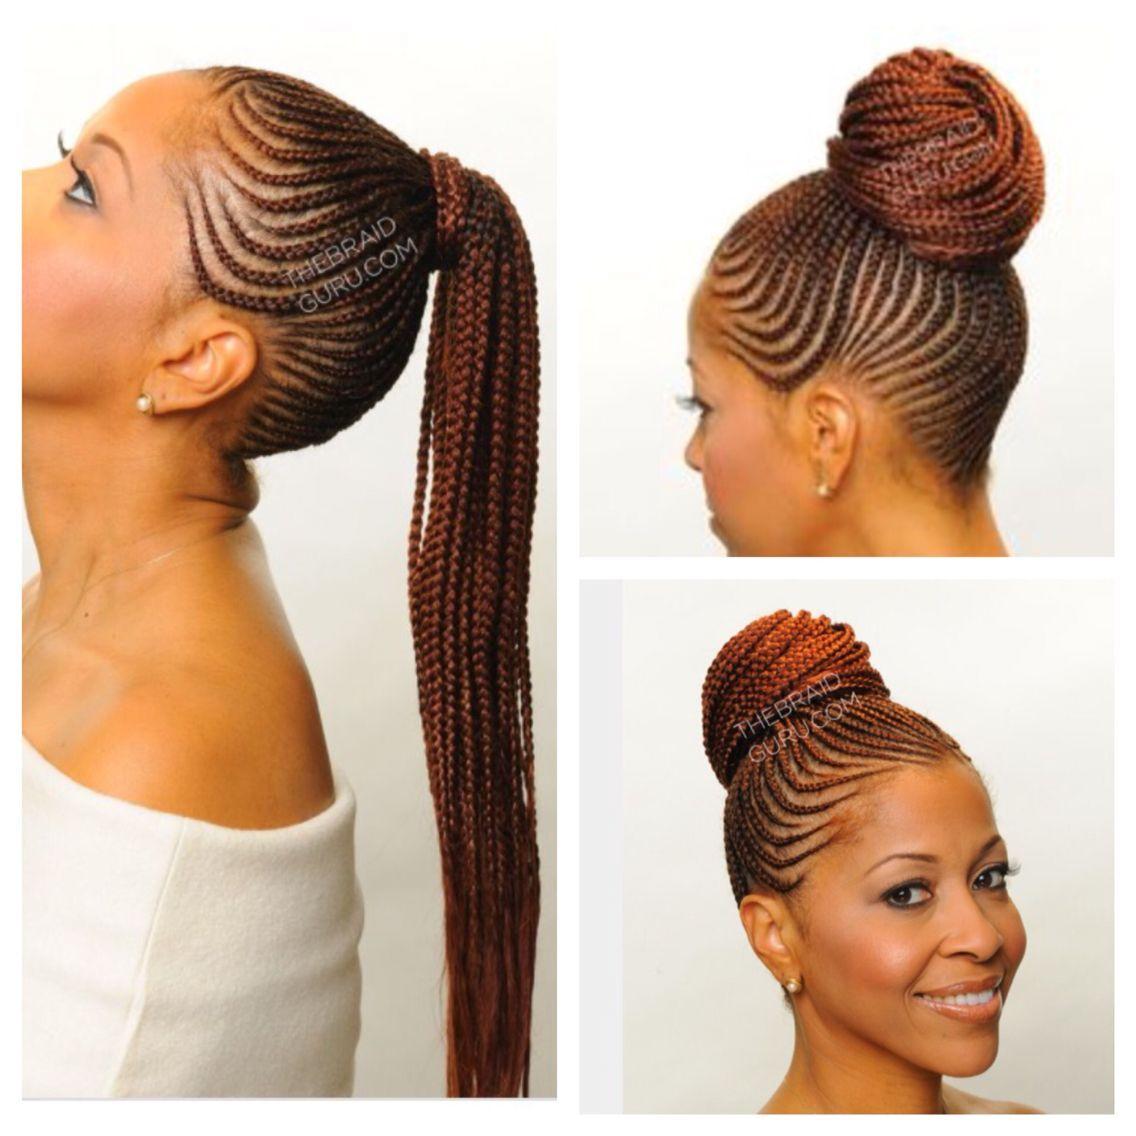 Braided updo bun african braids hairstyles cornrow updo